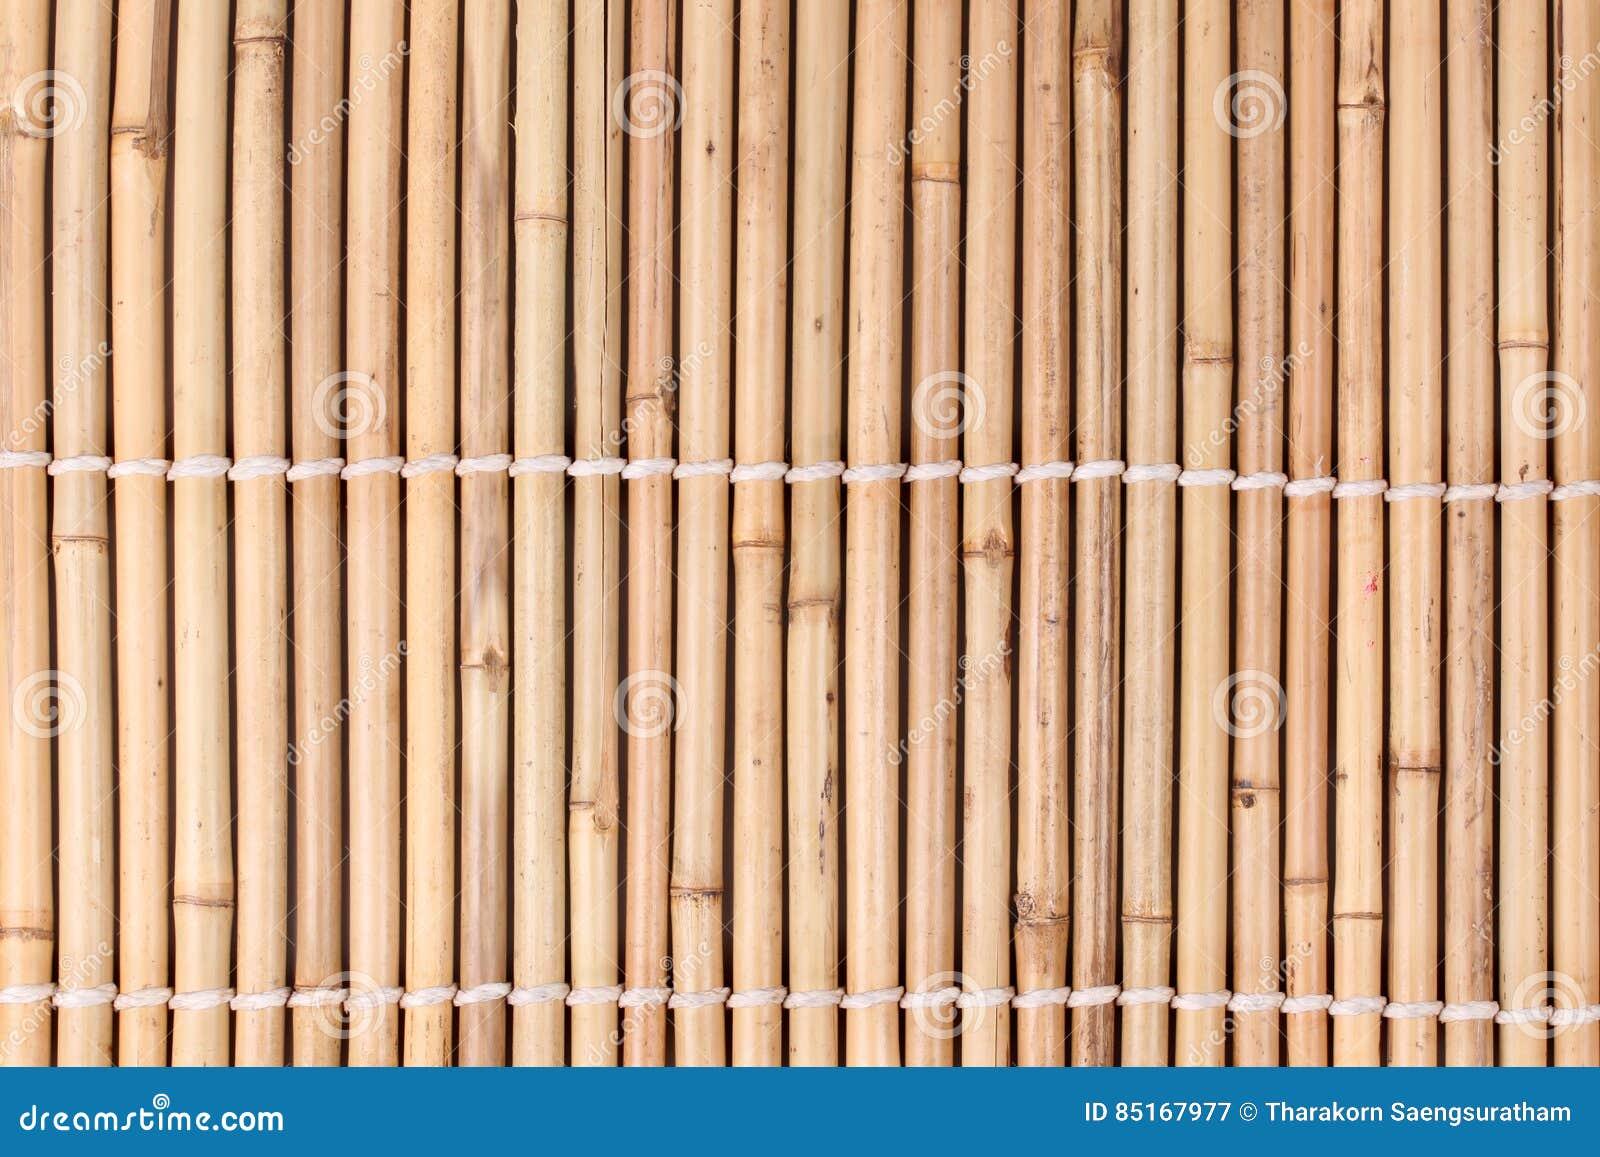 Bundet av torkad bambustjälkmodell i japansk stil